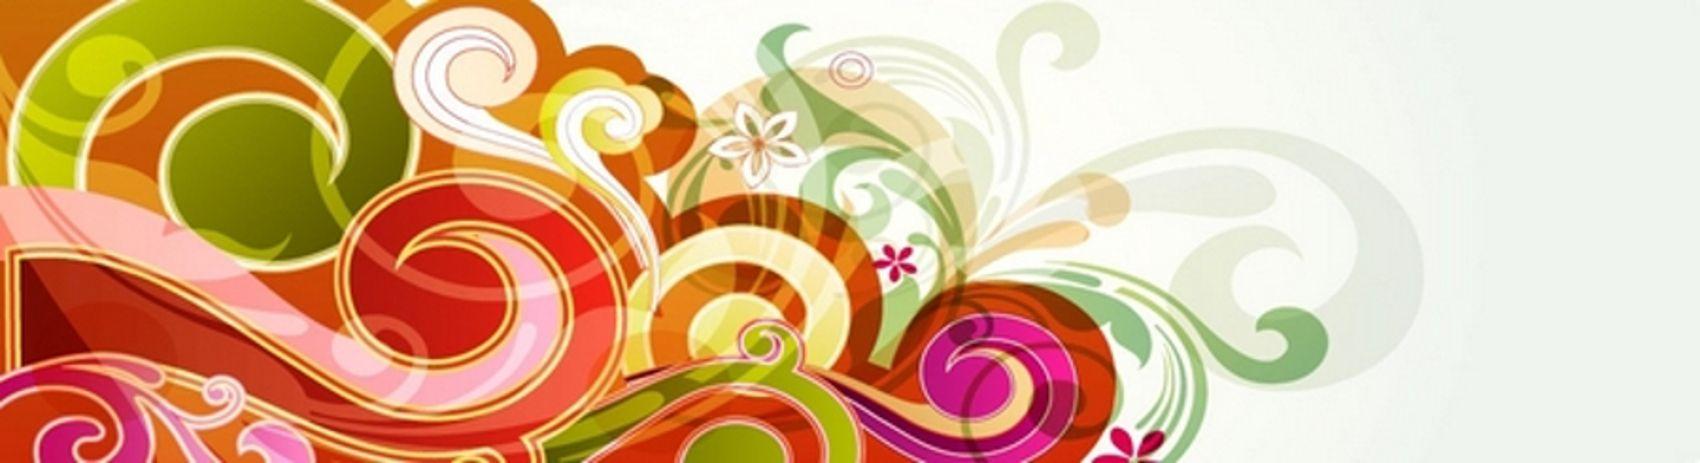 разноцветные завитушки